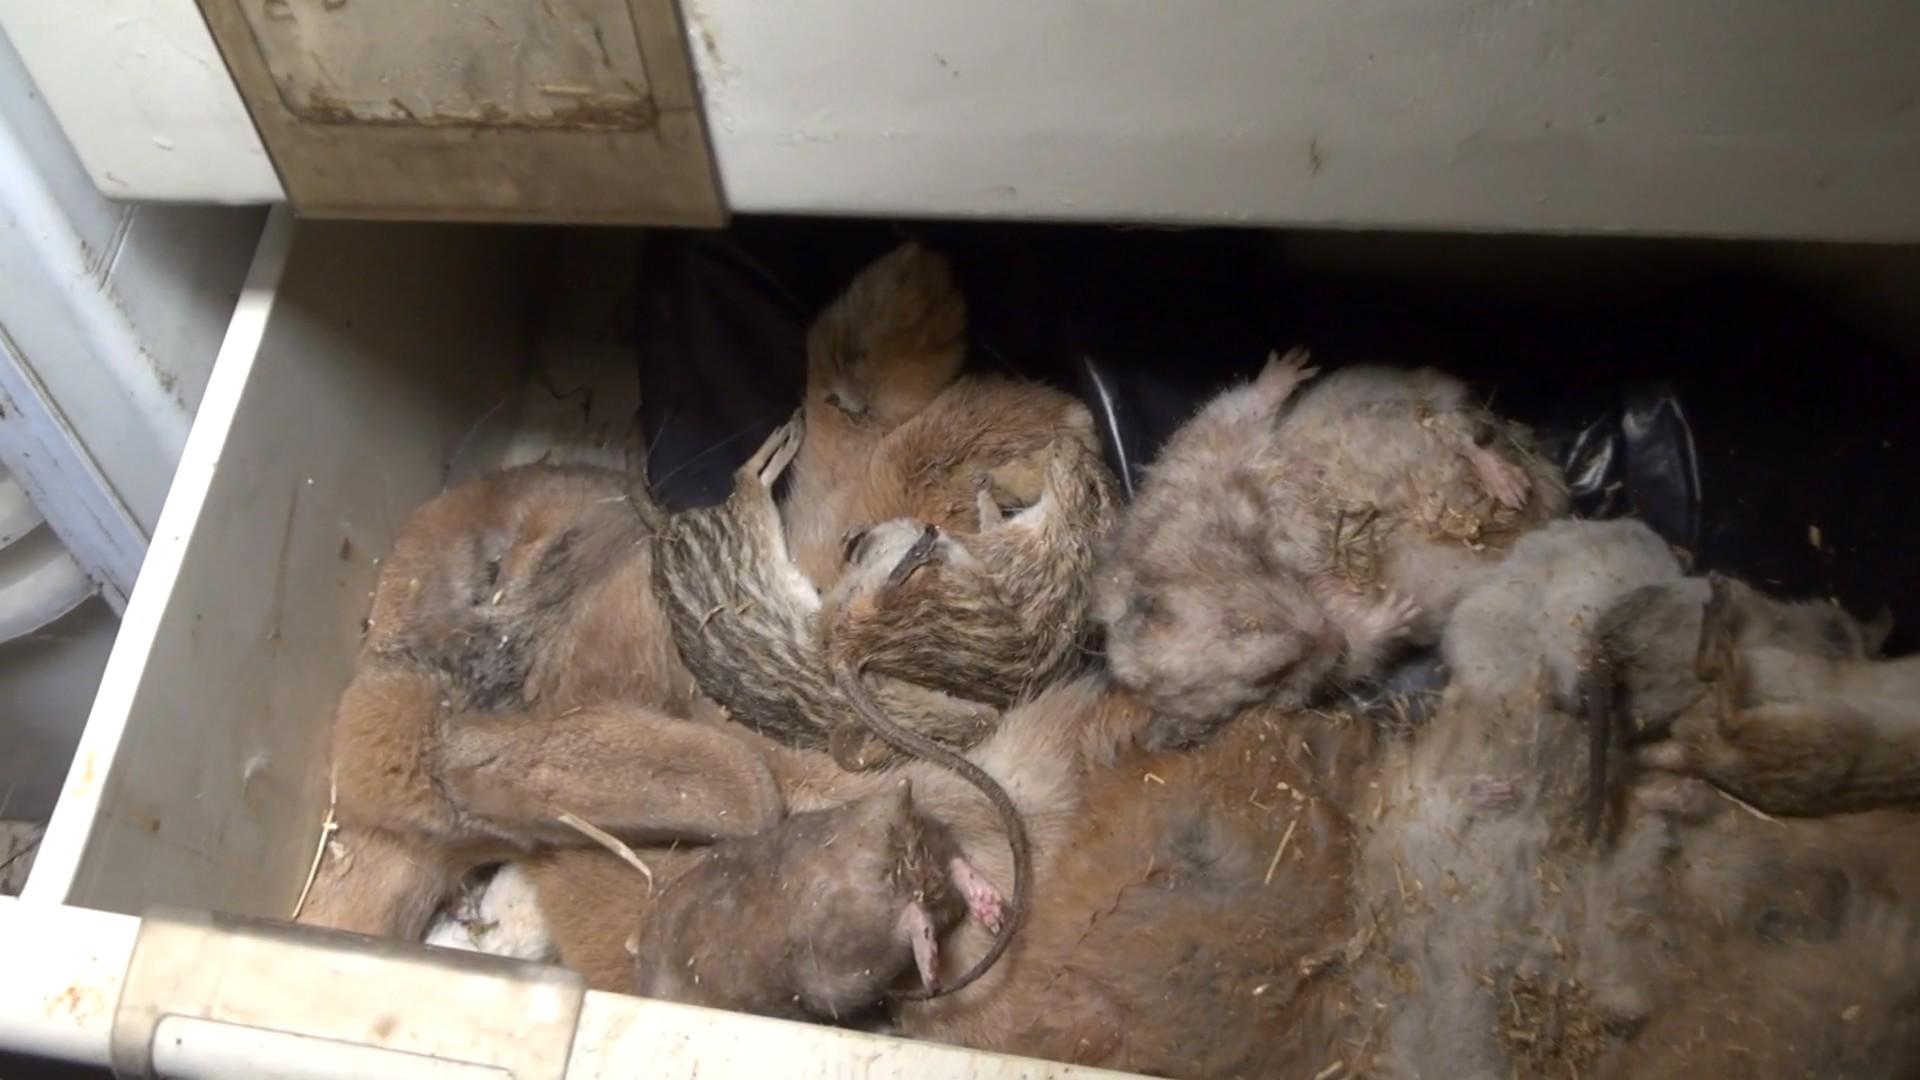 The Horrors Of The Pet Trade European Animal Breeders Exposed Peta Uk